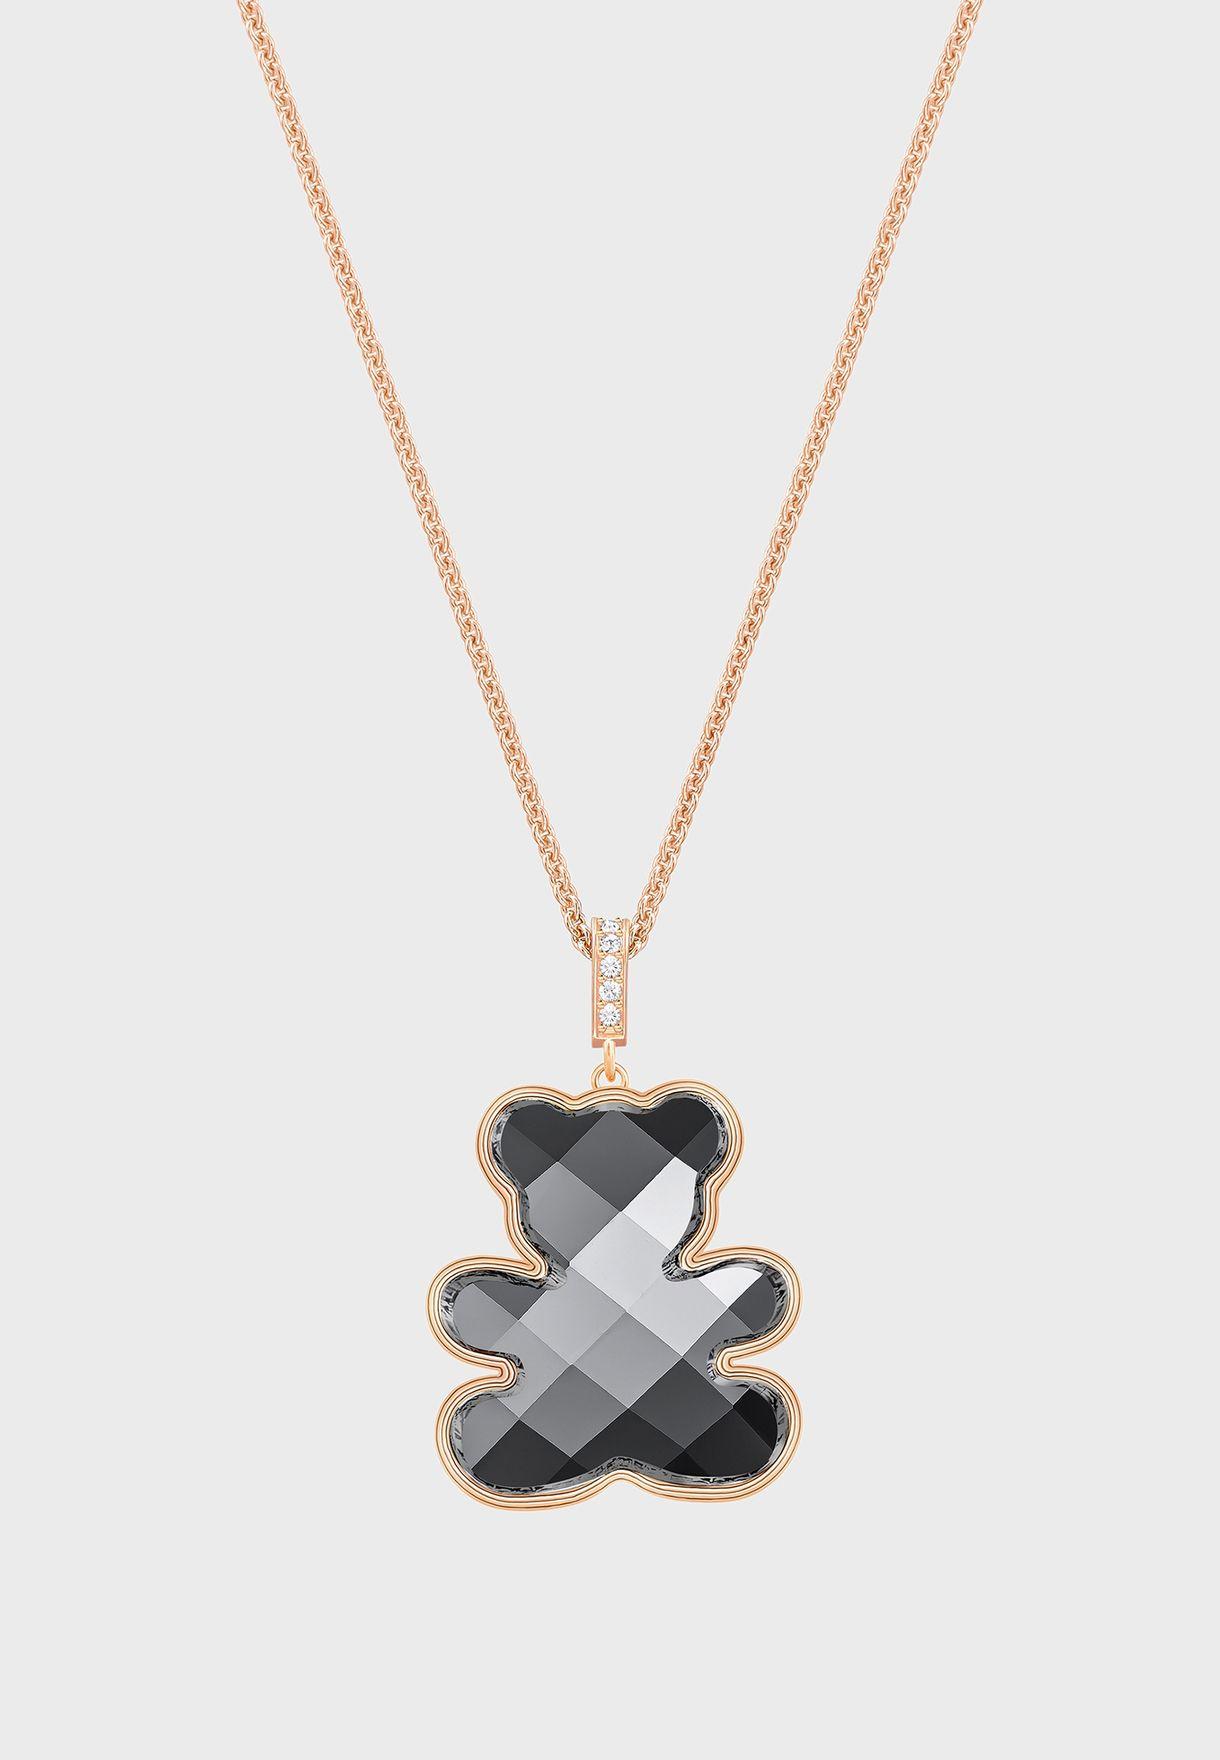 Teddy Pendant Necklace